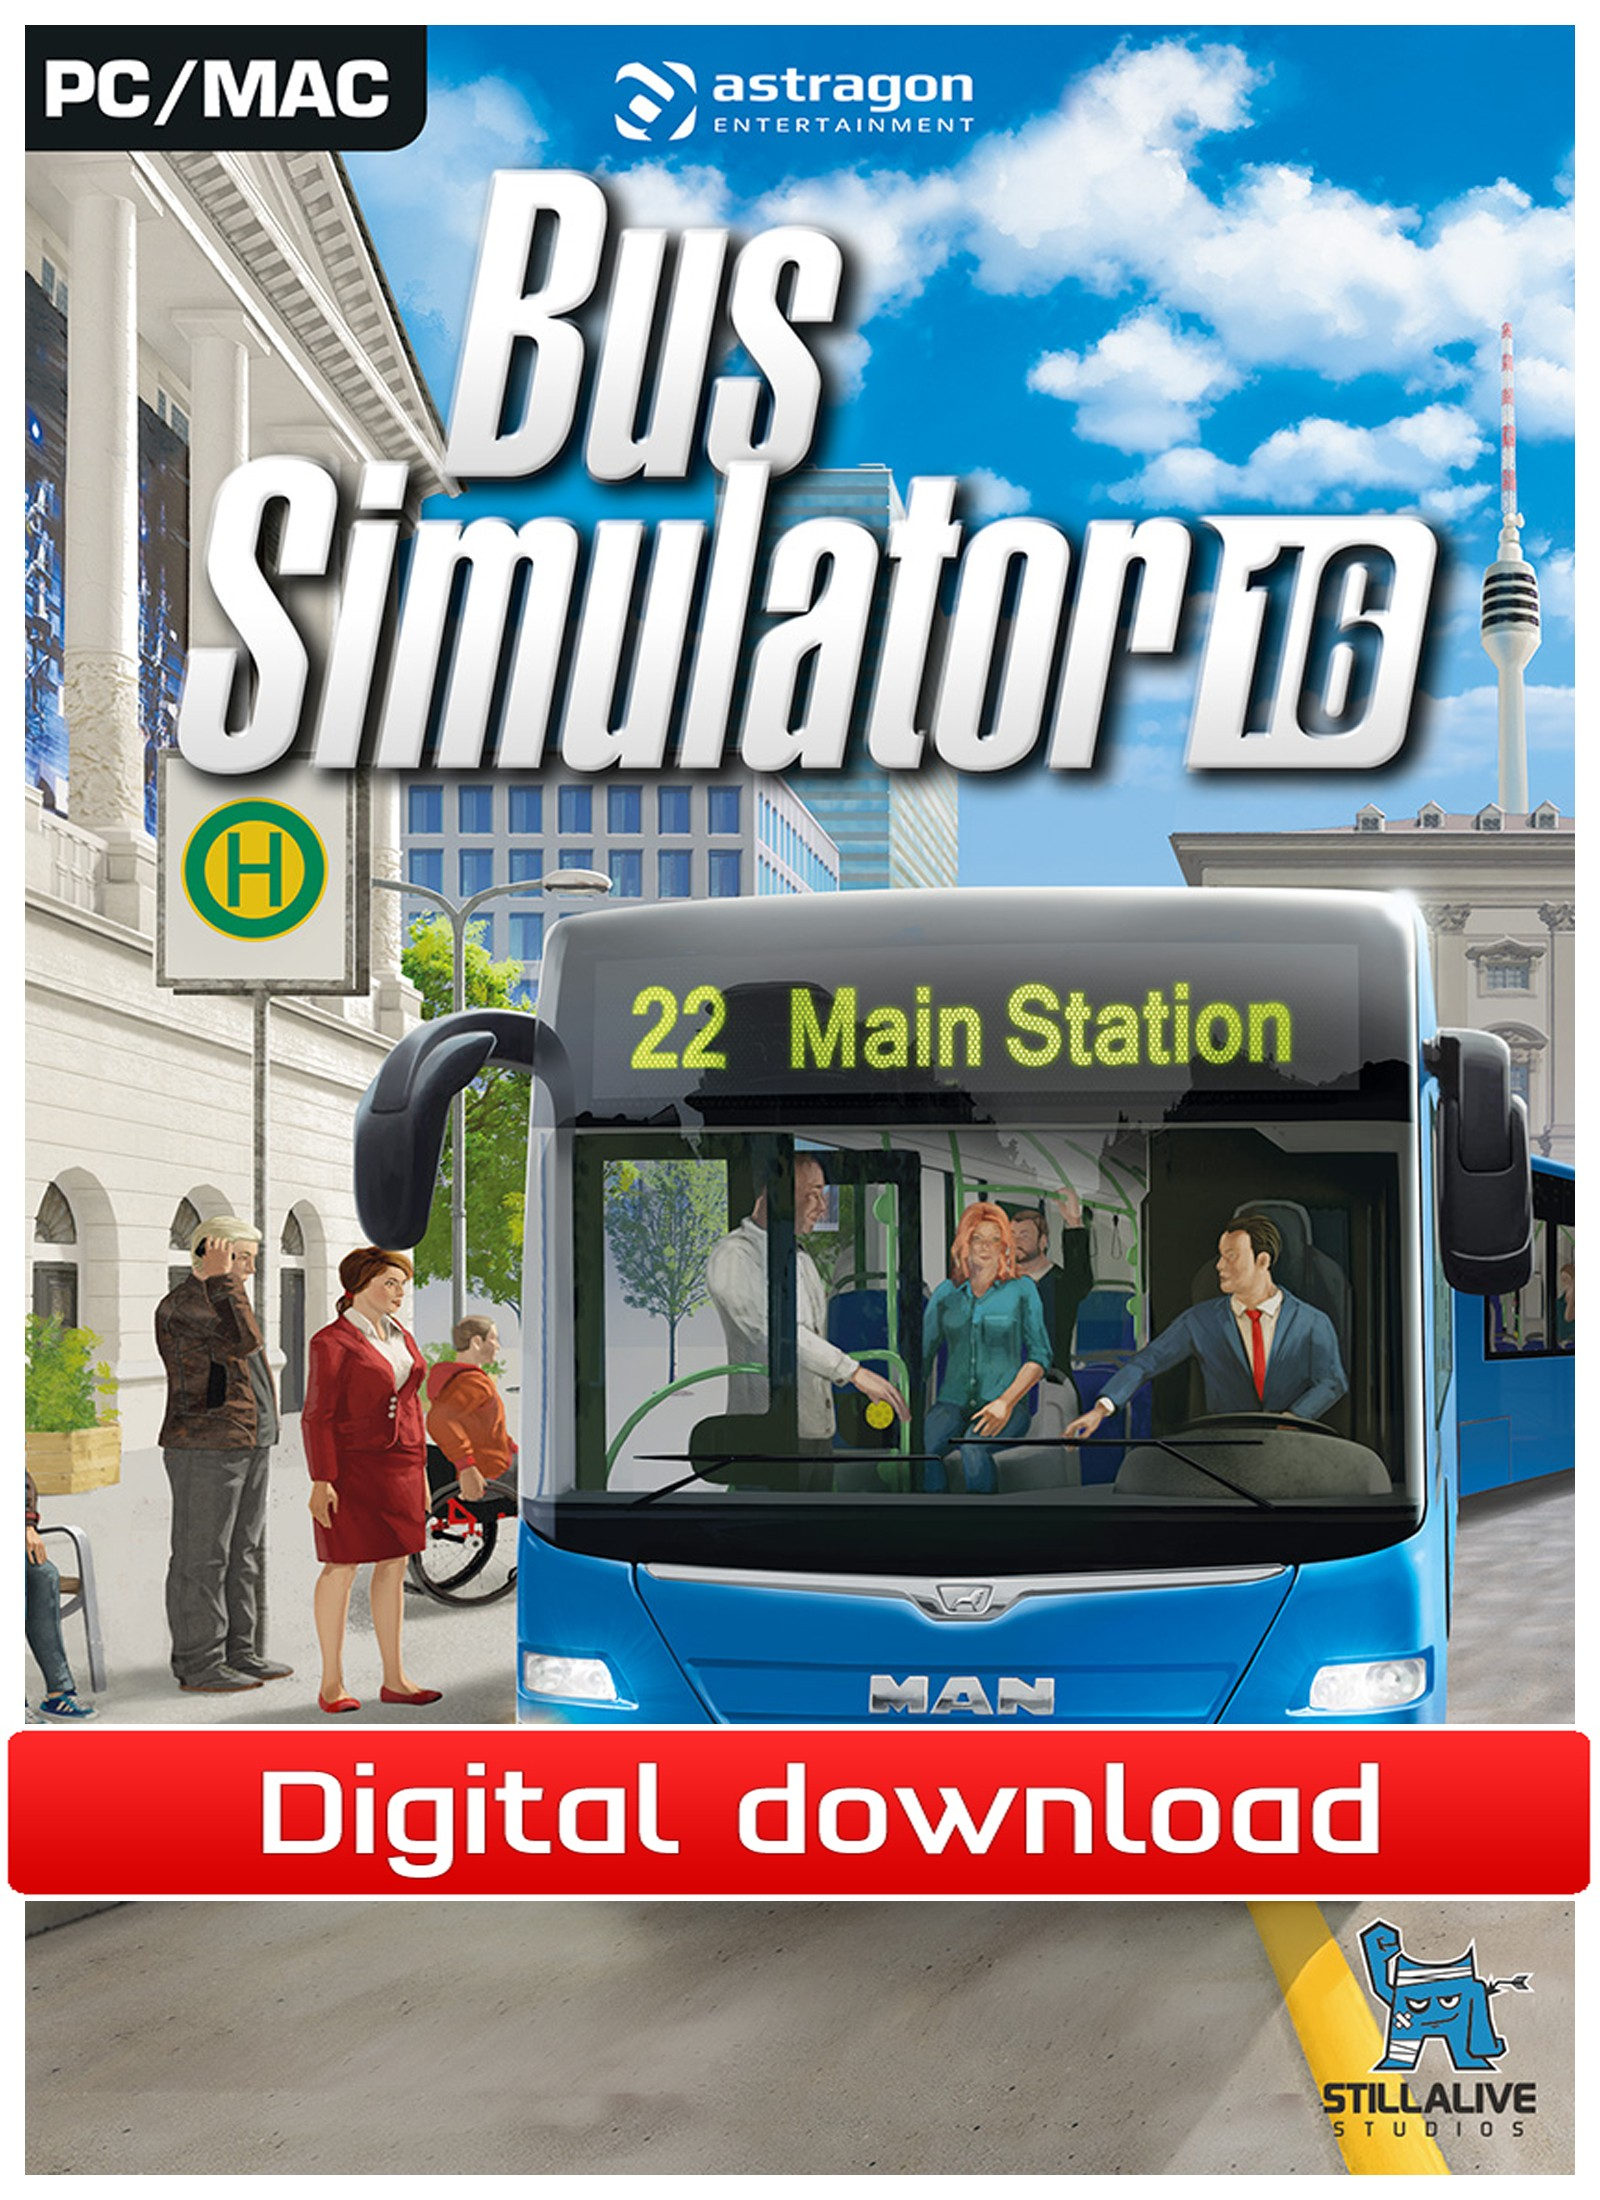 38951 : Bus Simulator 16 (PC nedlastning)